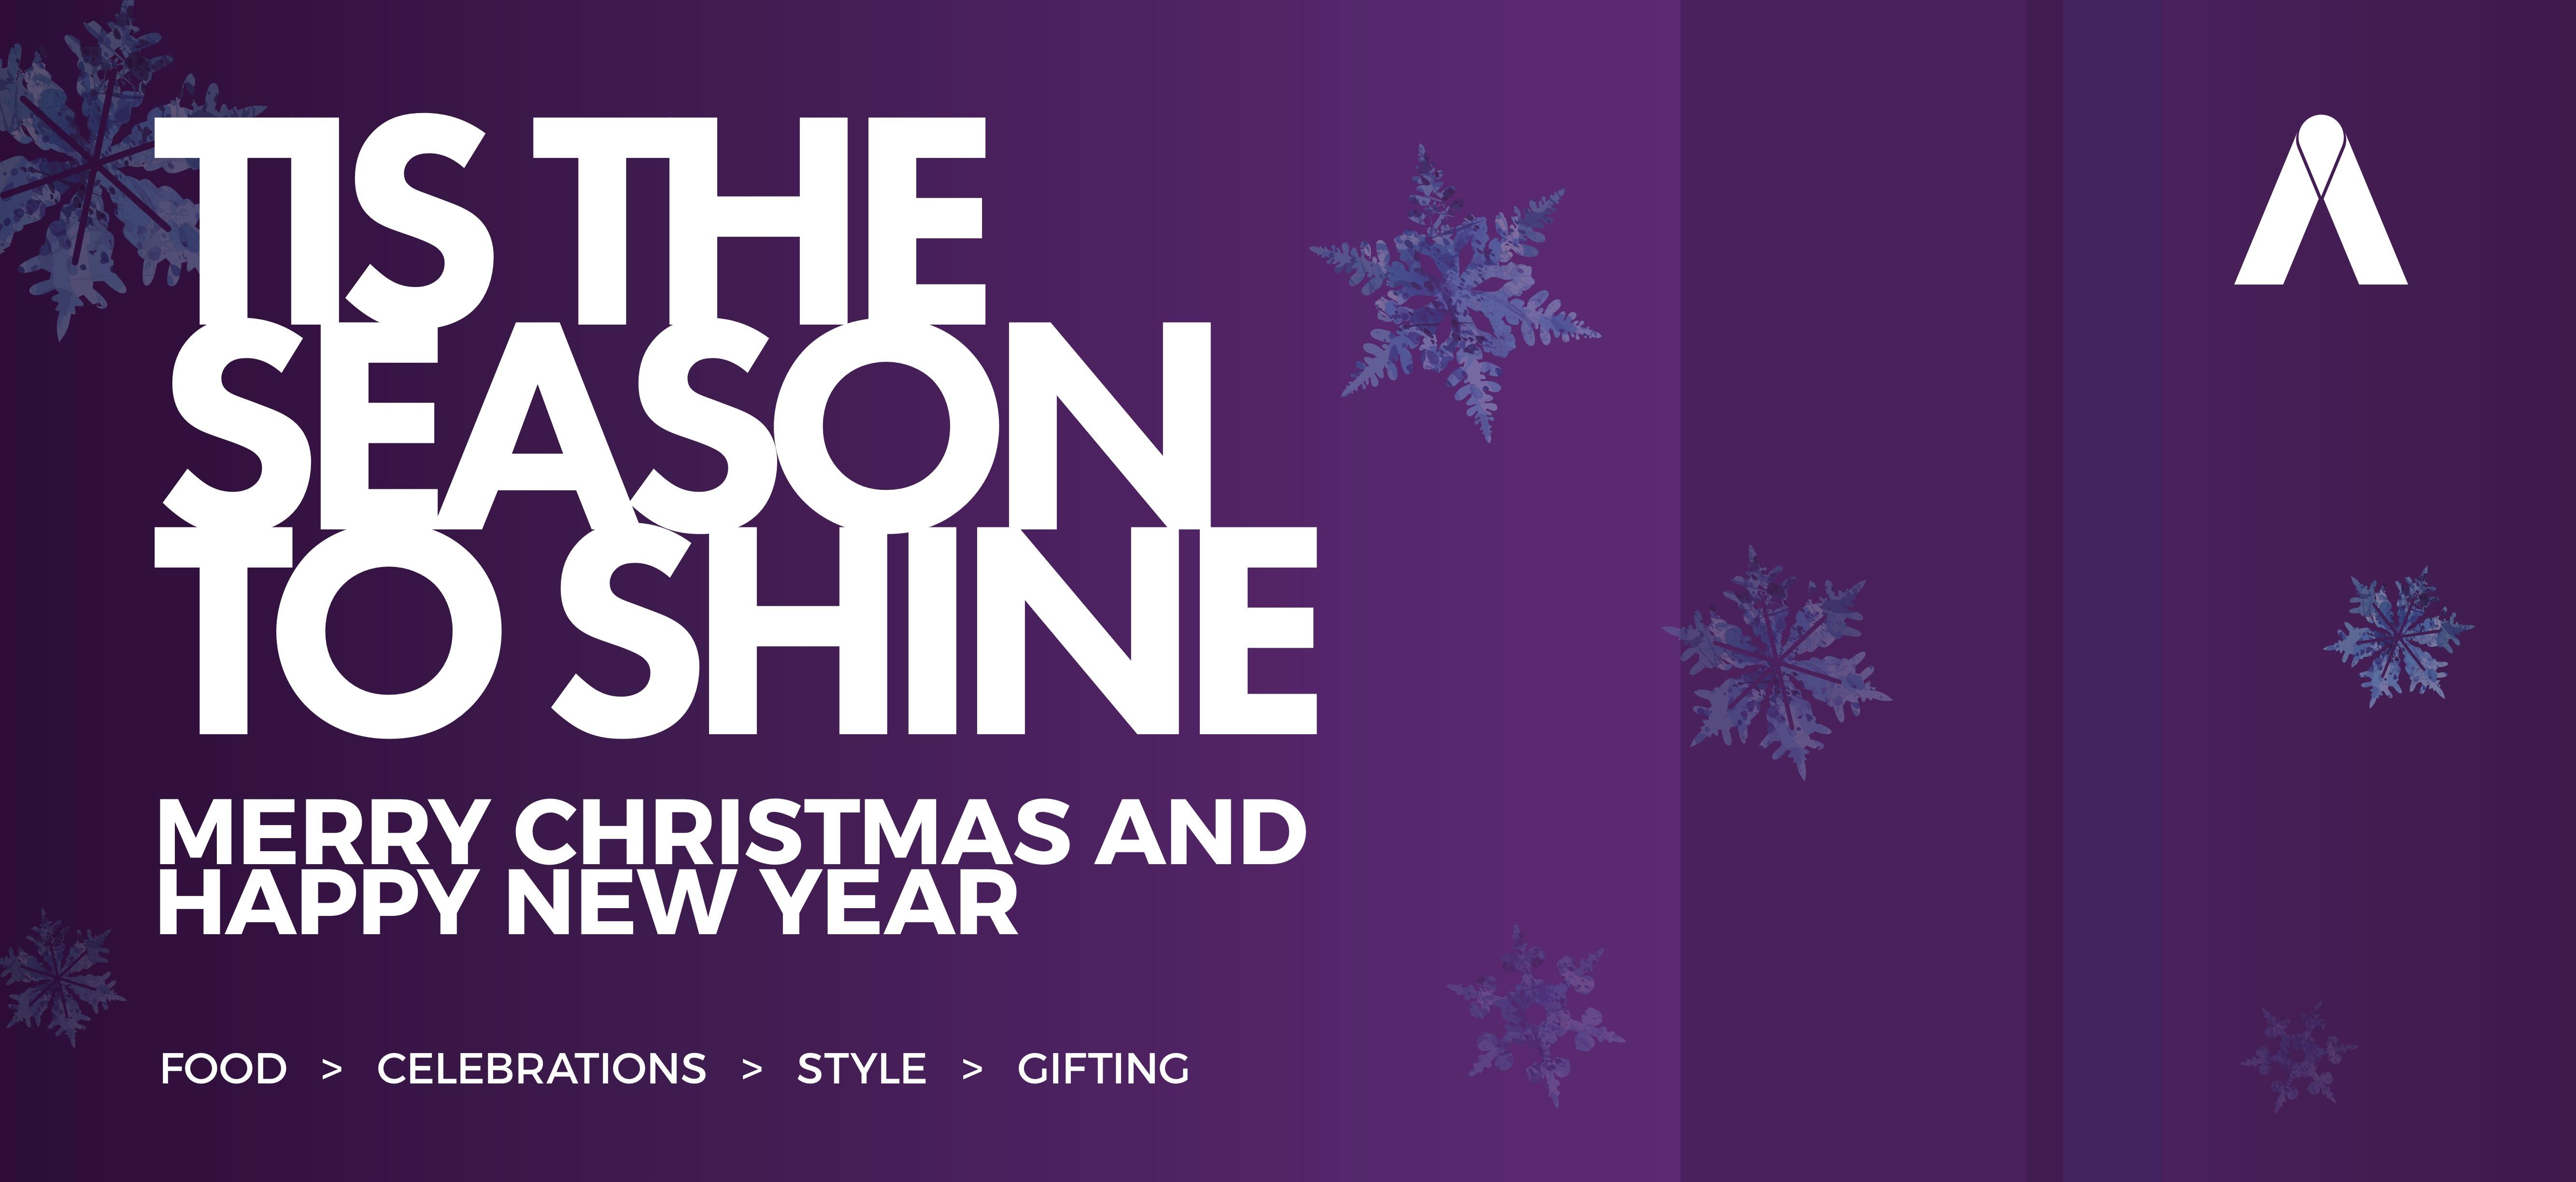 2018 Tis The Season Web Banner